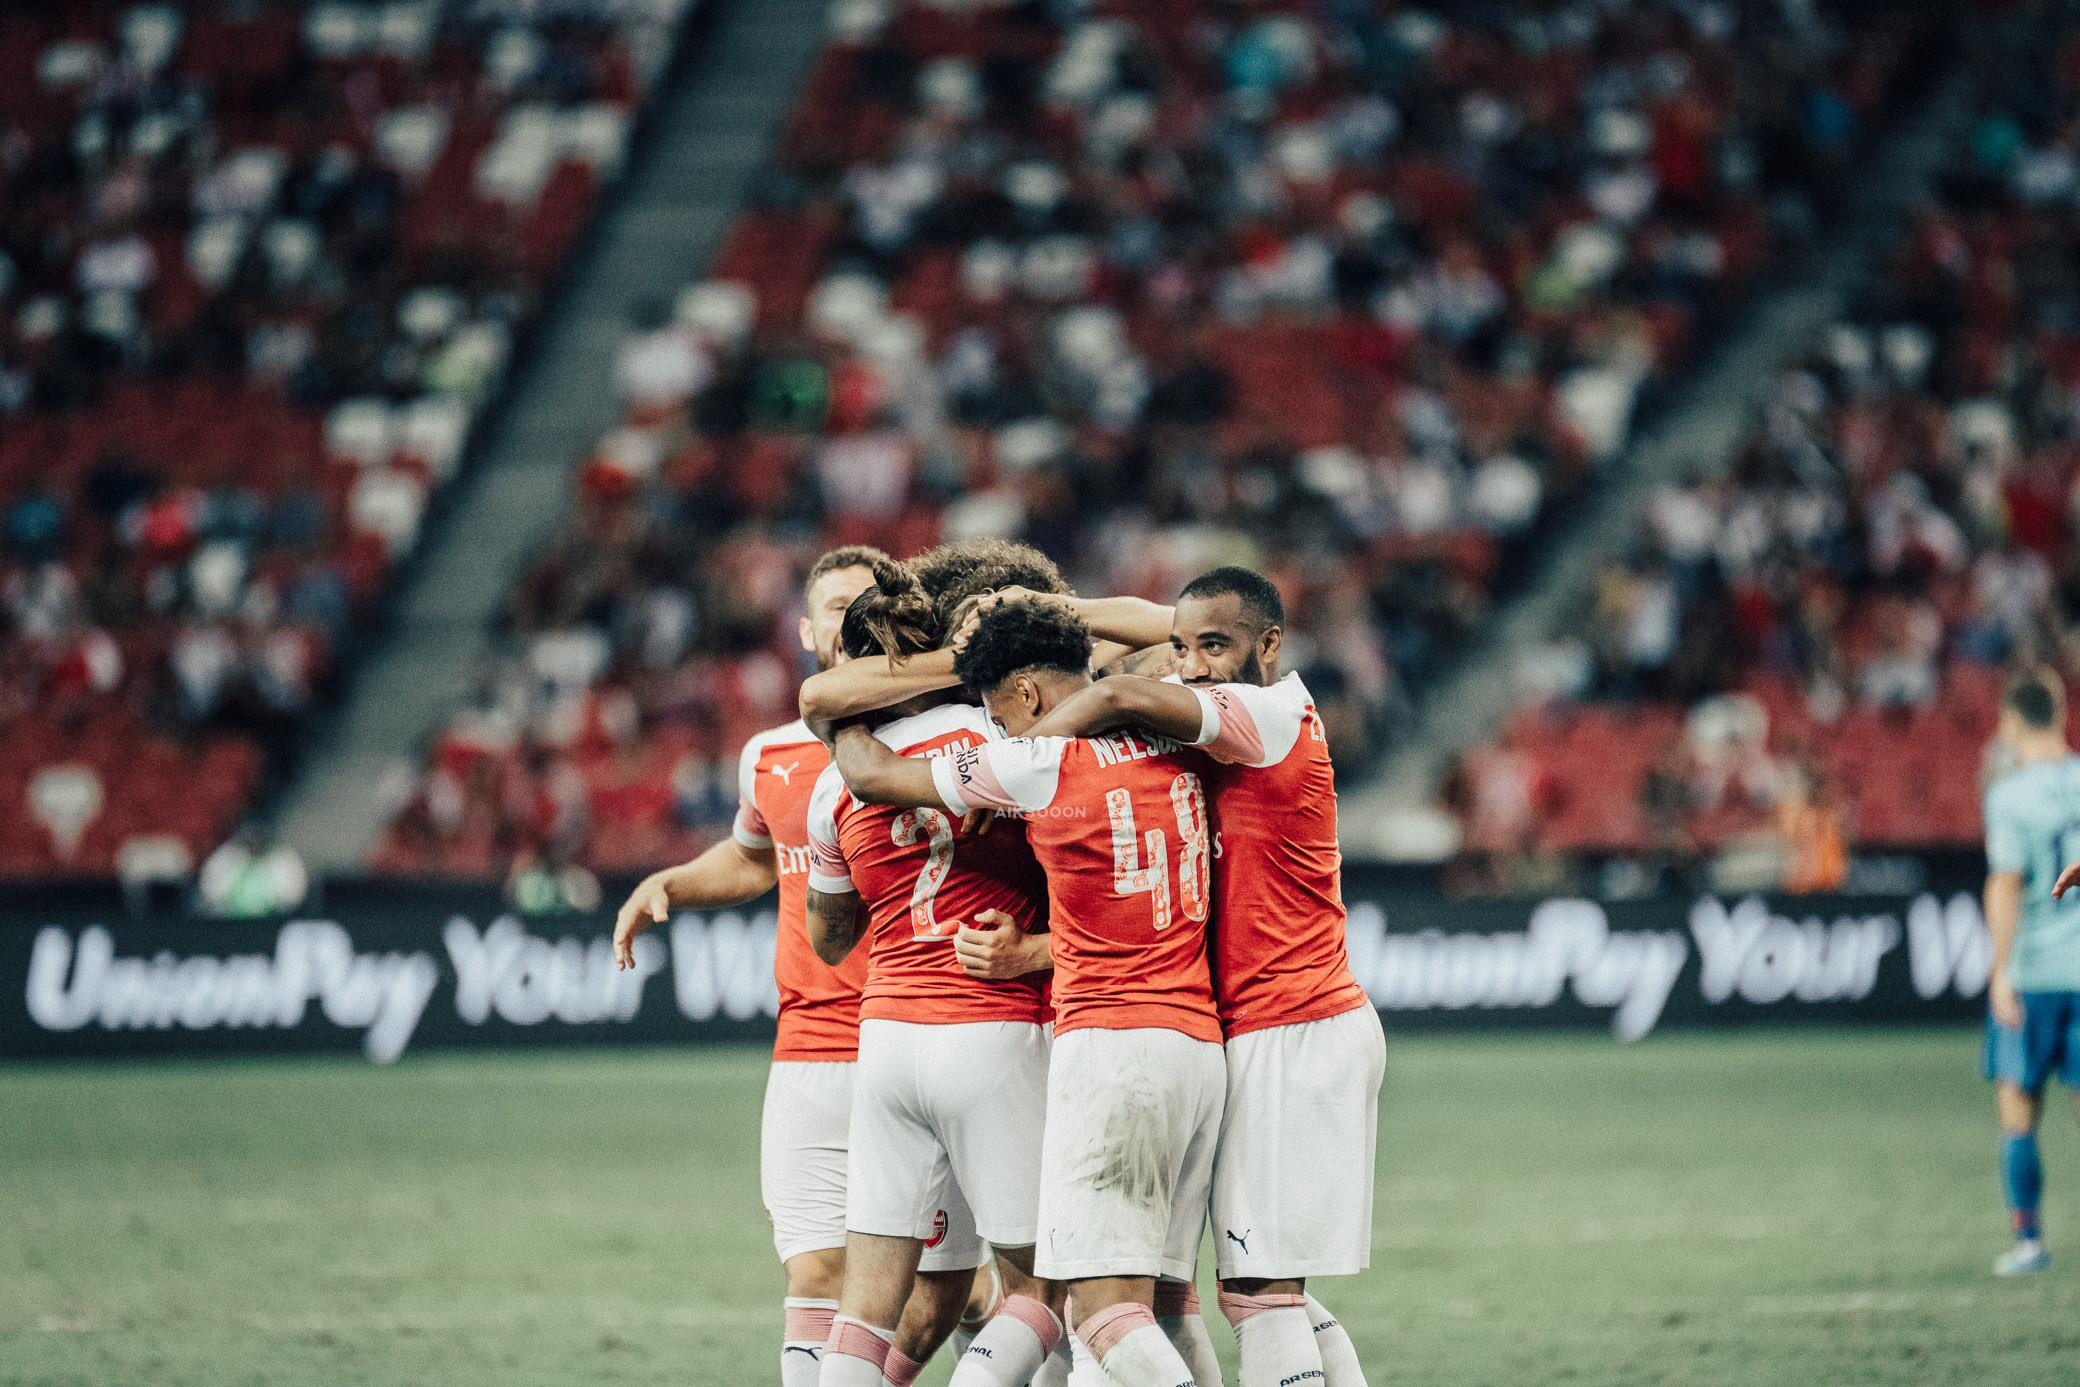 ICC 2018: ARSENAL VS ATLETICO